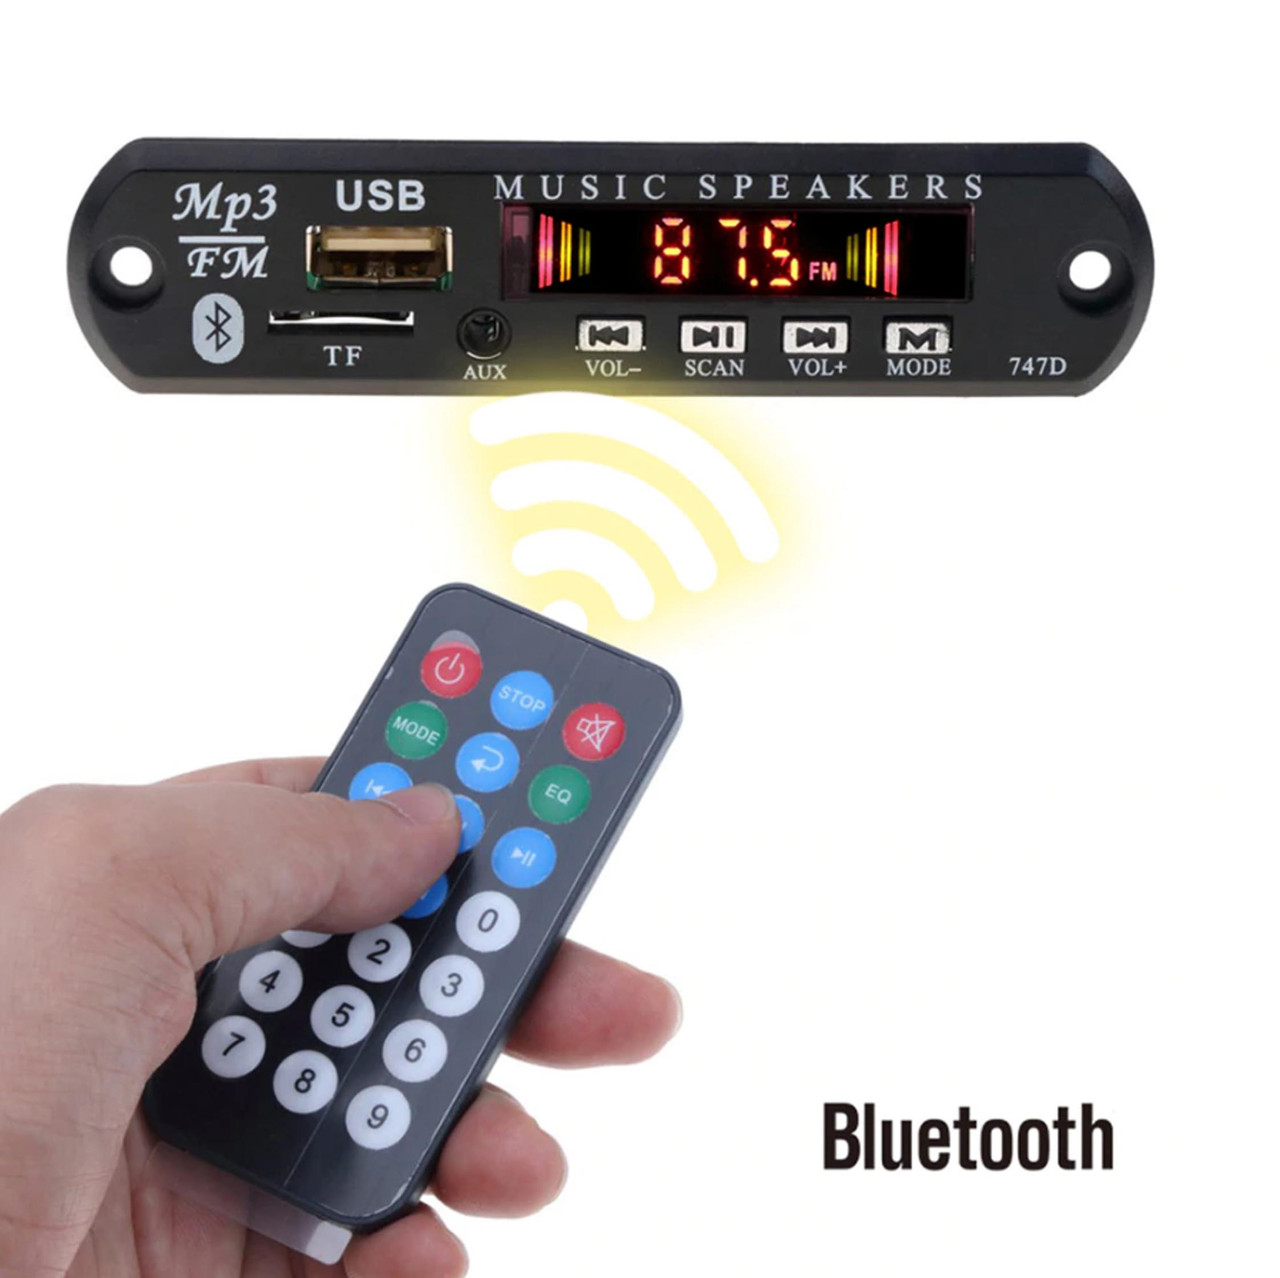 MP3 Bluetooth модуль с FM, USB, microSD, DC 5-12В (встраиваемый)